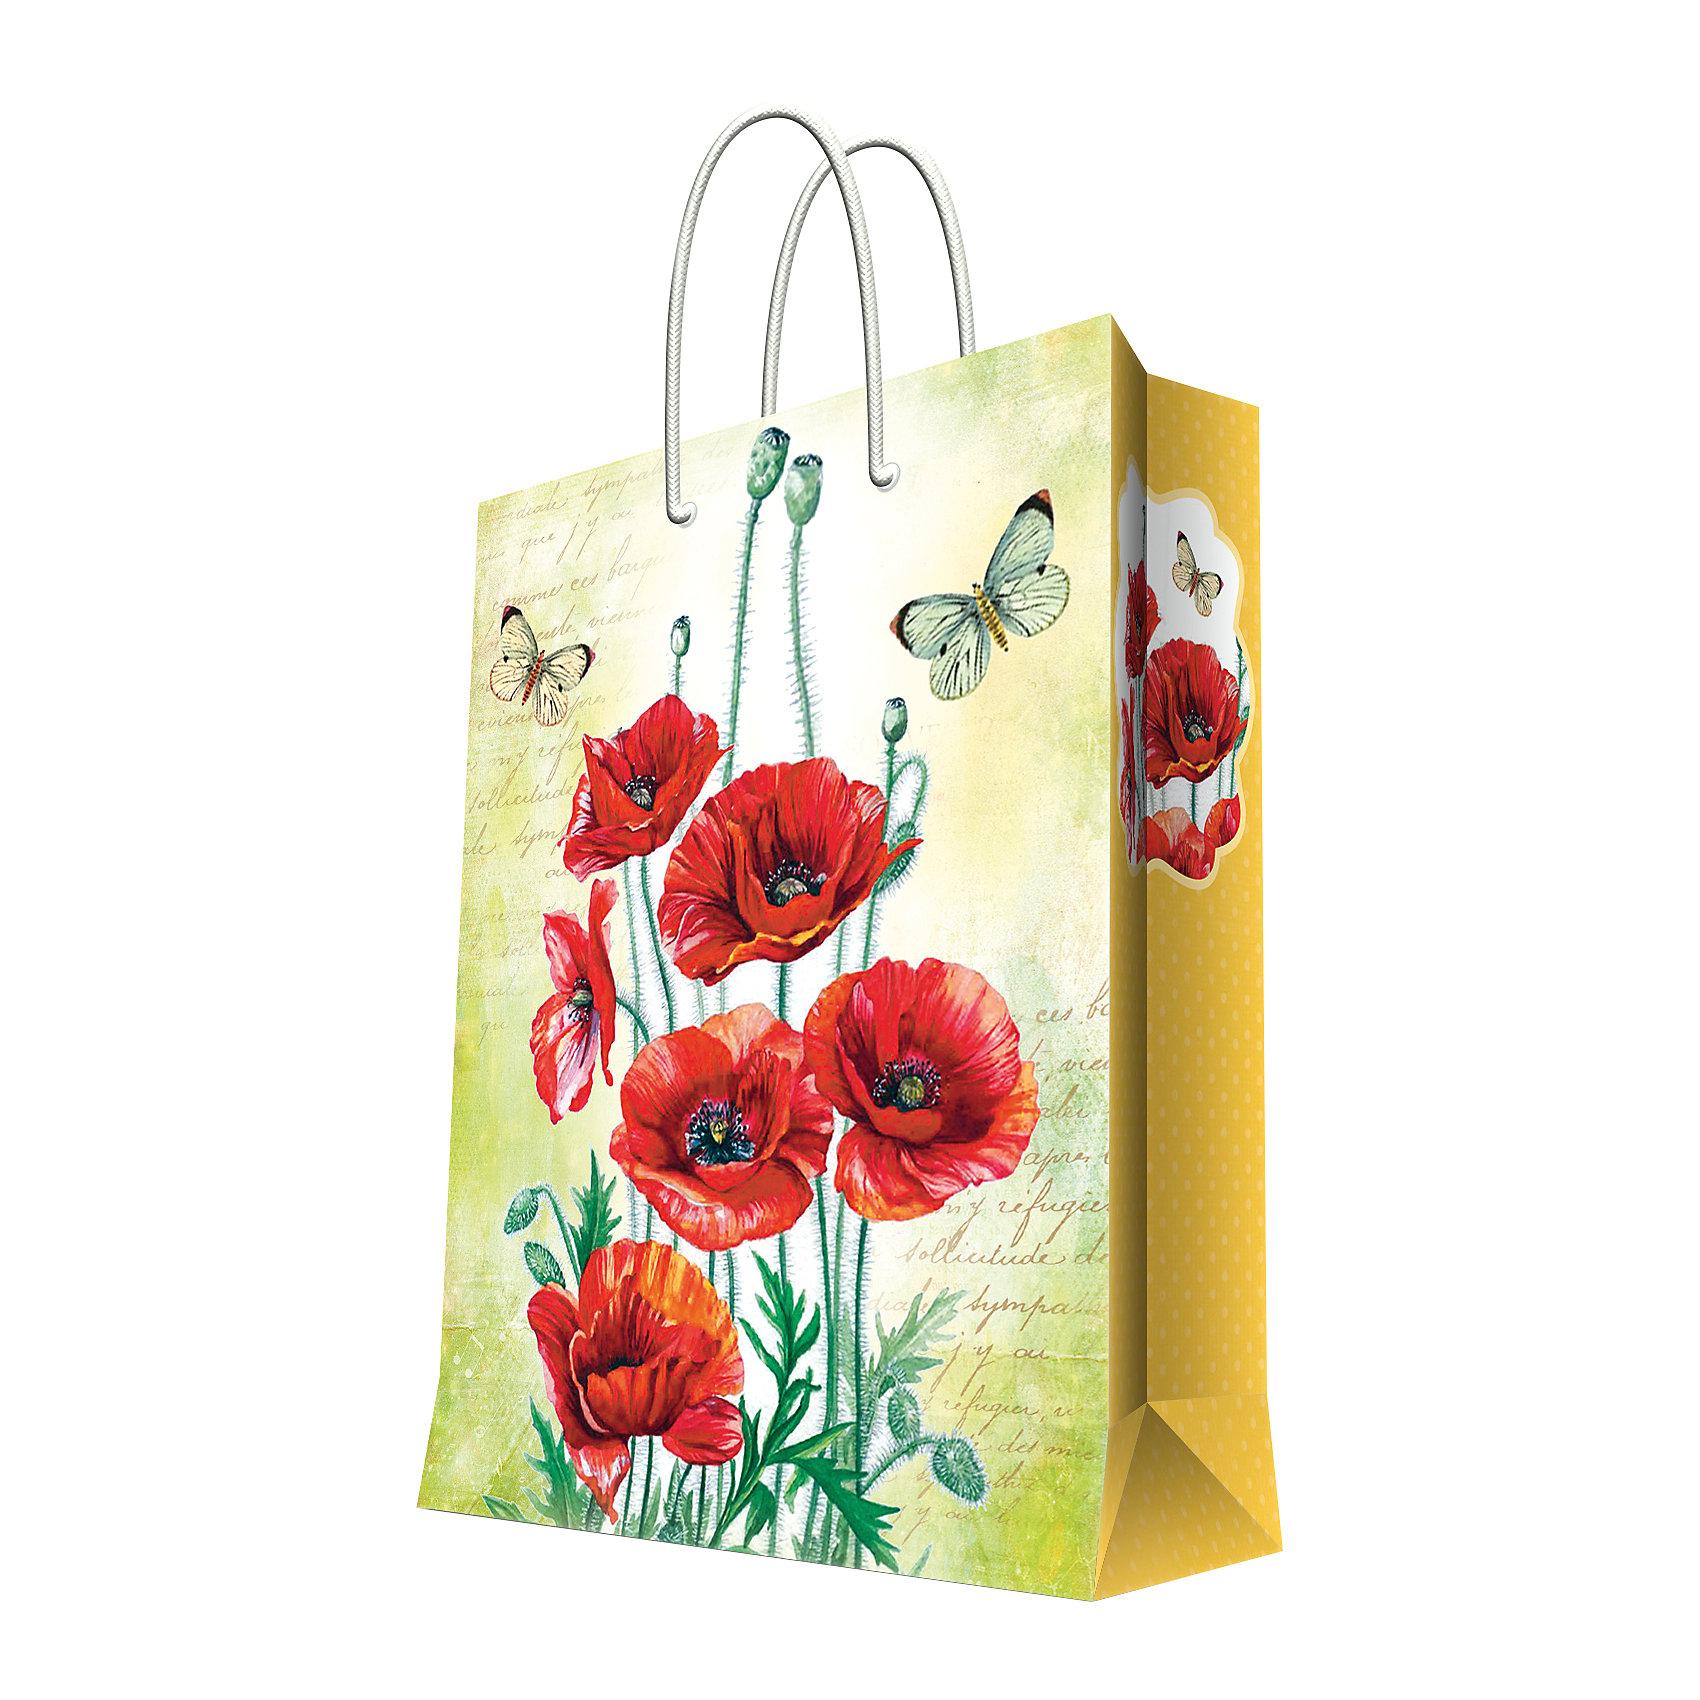 Феникс-Презент Подарочный пакет Маки 26*32,4*12,7 см феникс презент подарочный пакет лимоны 26 32 4 12 7 см